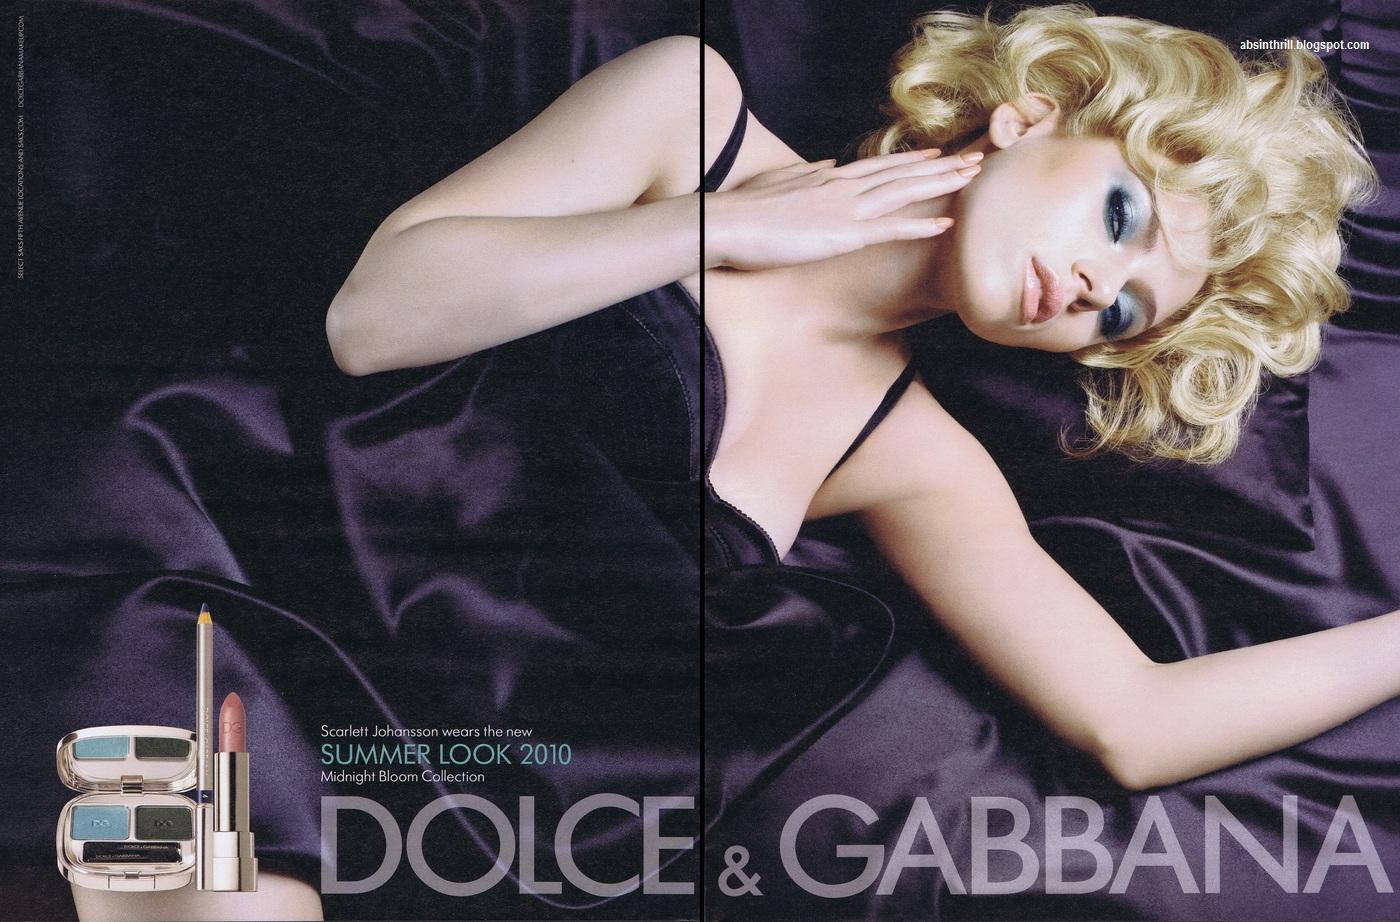 http://3.bp.blogspot.com/_vX2JZHFno7o/S_UYOScWerI/AAAAAAAAeU8/1k-aPaNcI6g/s1600/Scarlett+Johansson.jpg